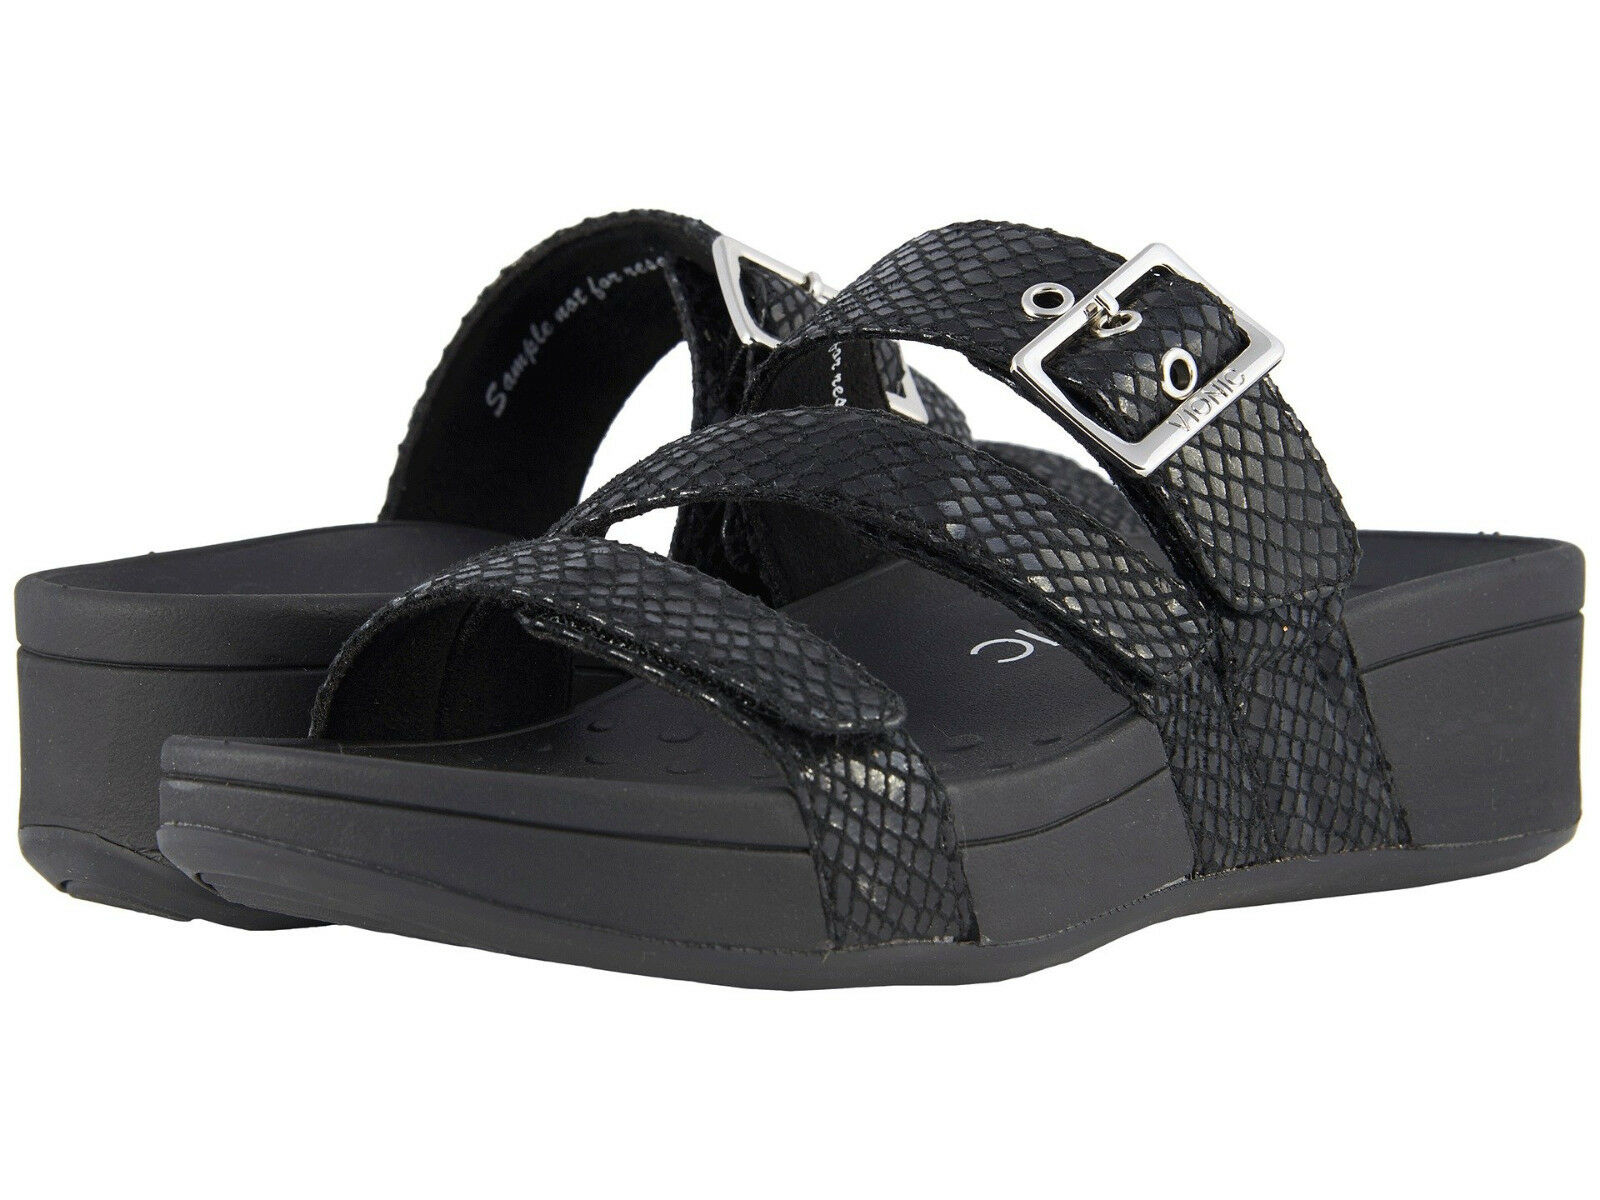 donna Vionic Orthaheel Rio Strappy Sandal 10001130 nero Snake 100% 100% 100% Original New a2e1be